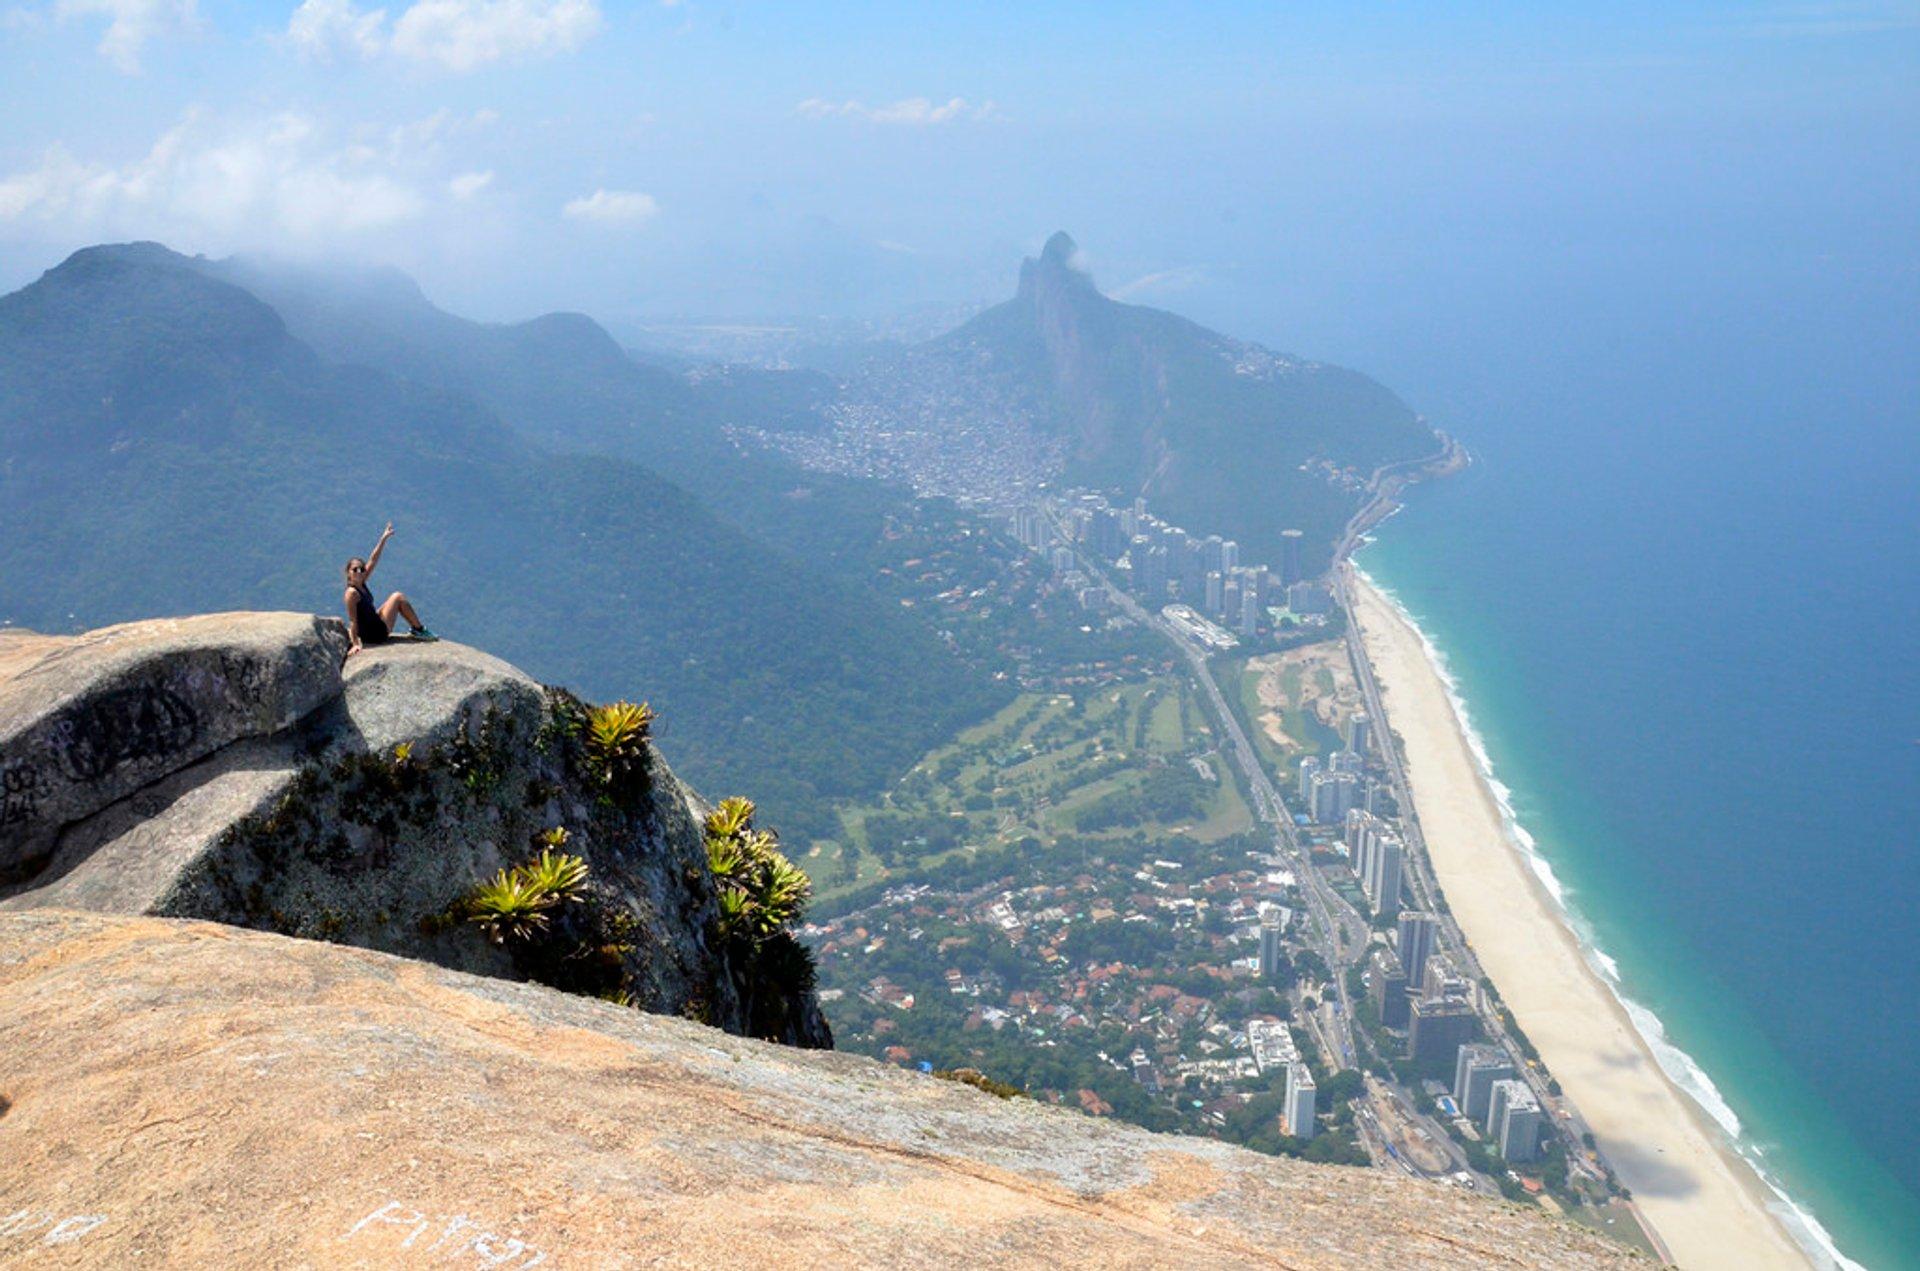 Hiking in Rio de Janeiro 2020 - Best Time